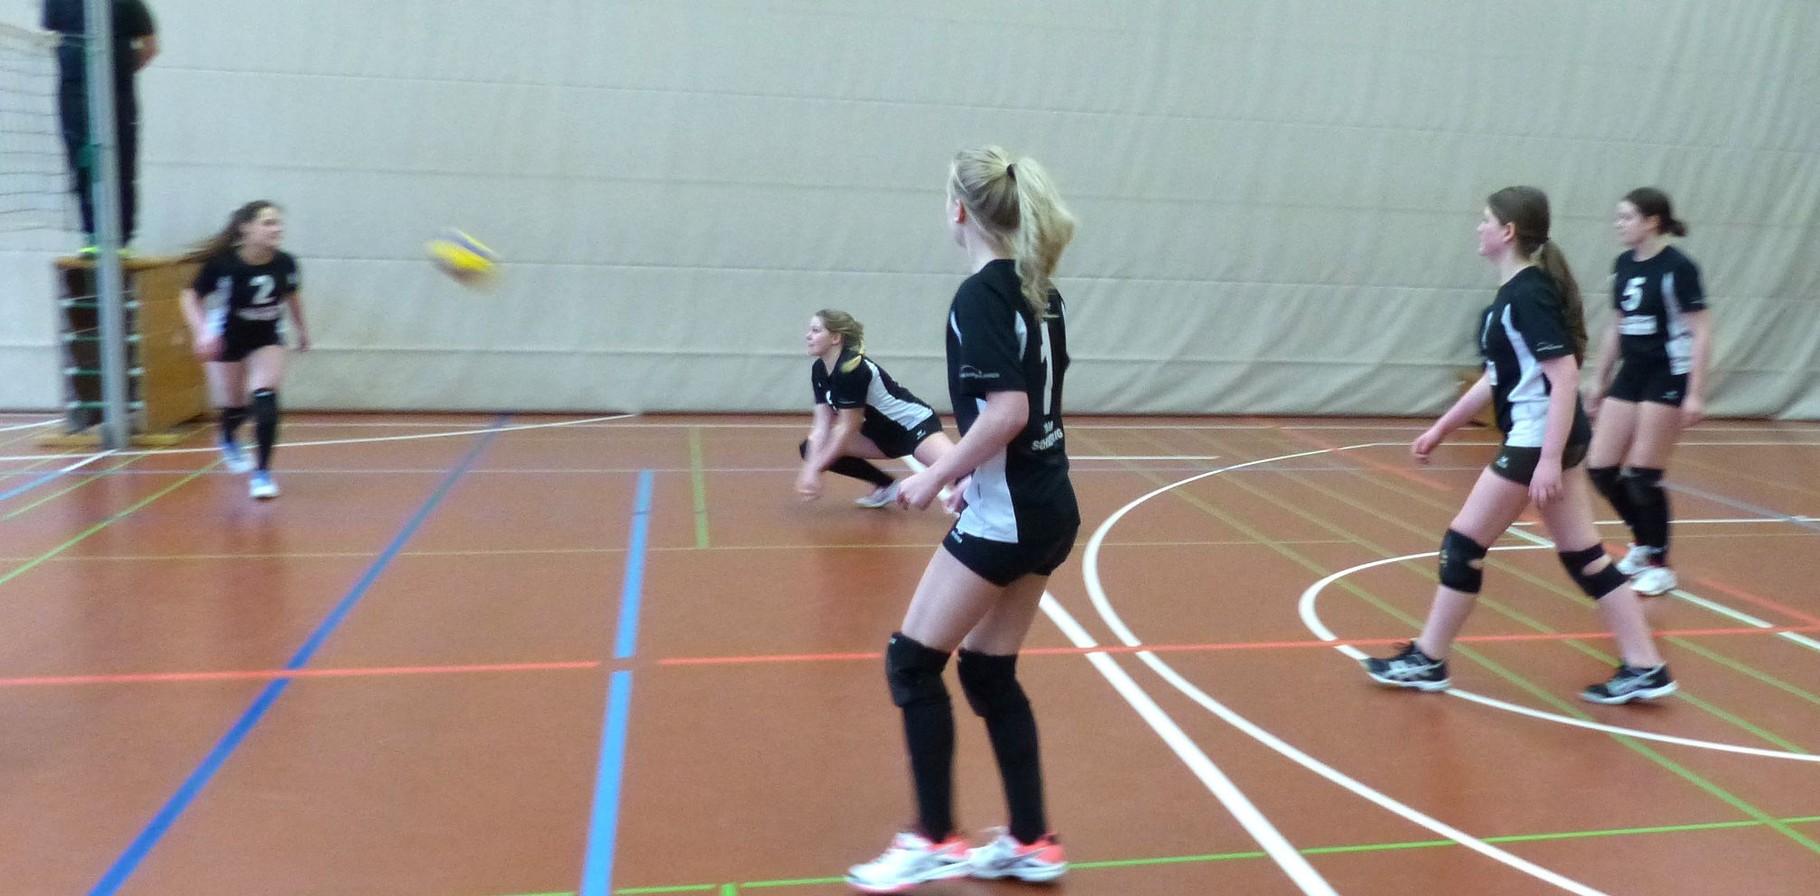 Lea K. antizipiert und bekommt den knappen Ball.